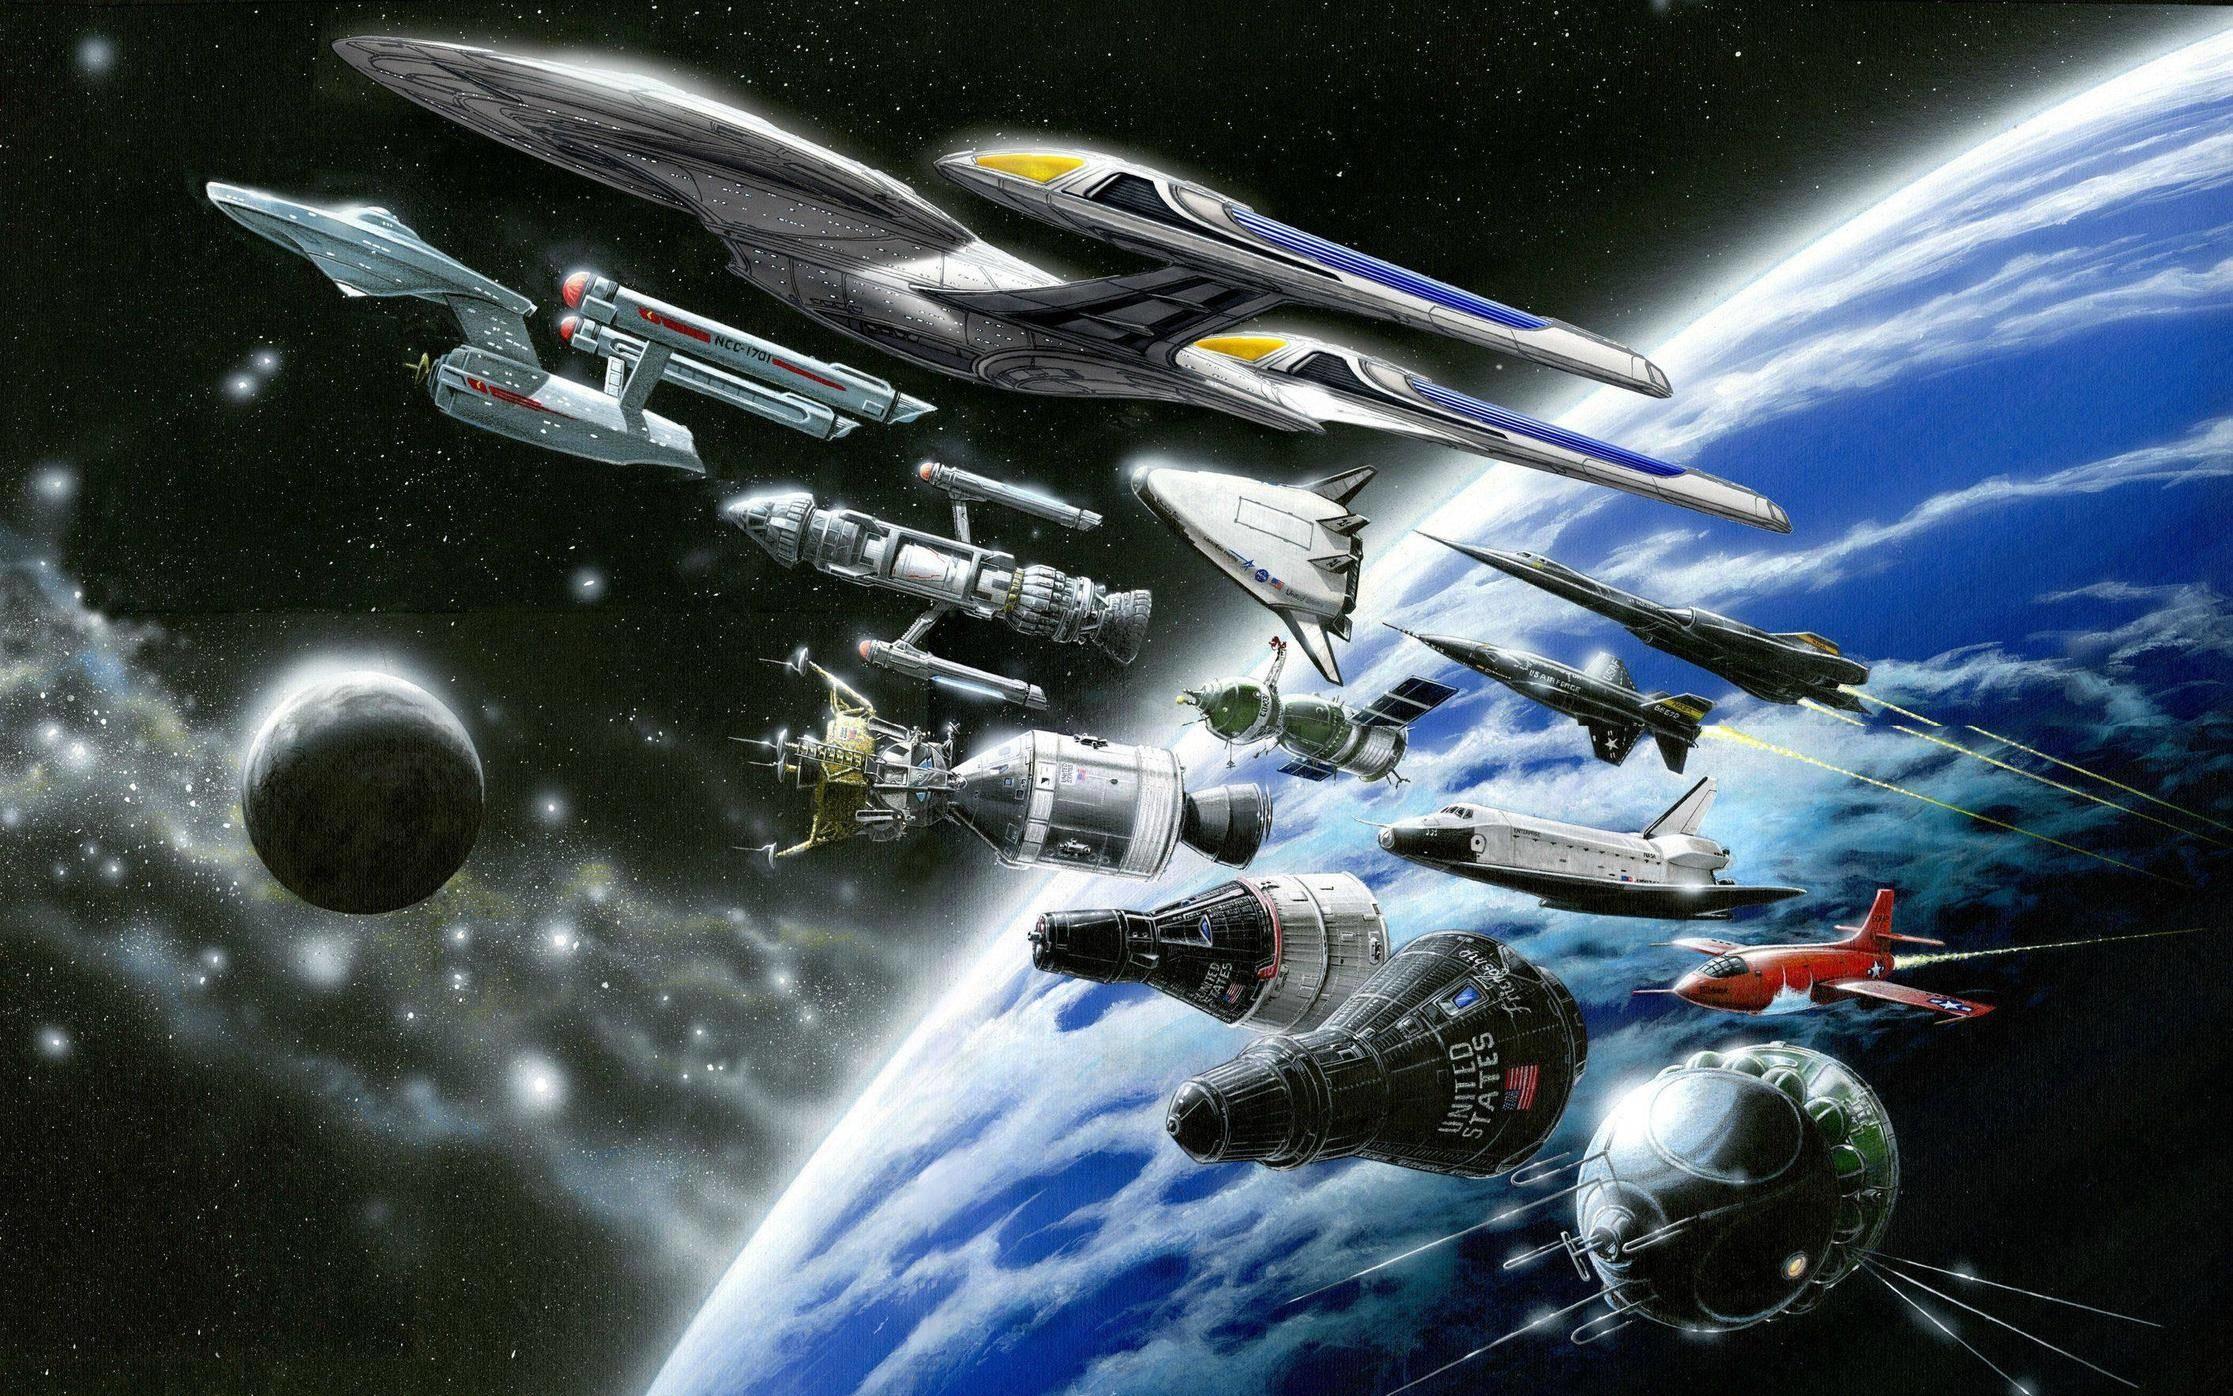 Star Trek Starship Enterprise Spaceship NASA Shuttle Drawing Stars .